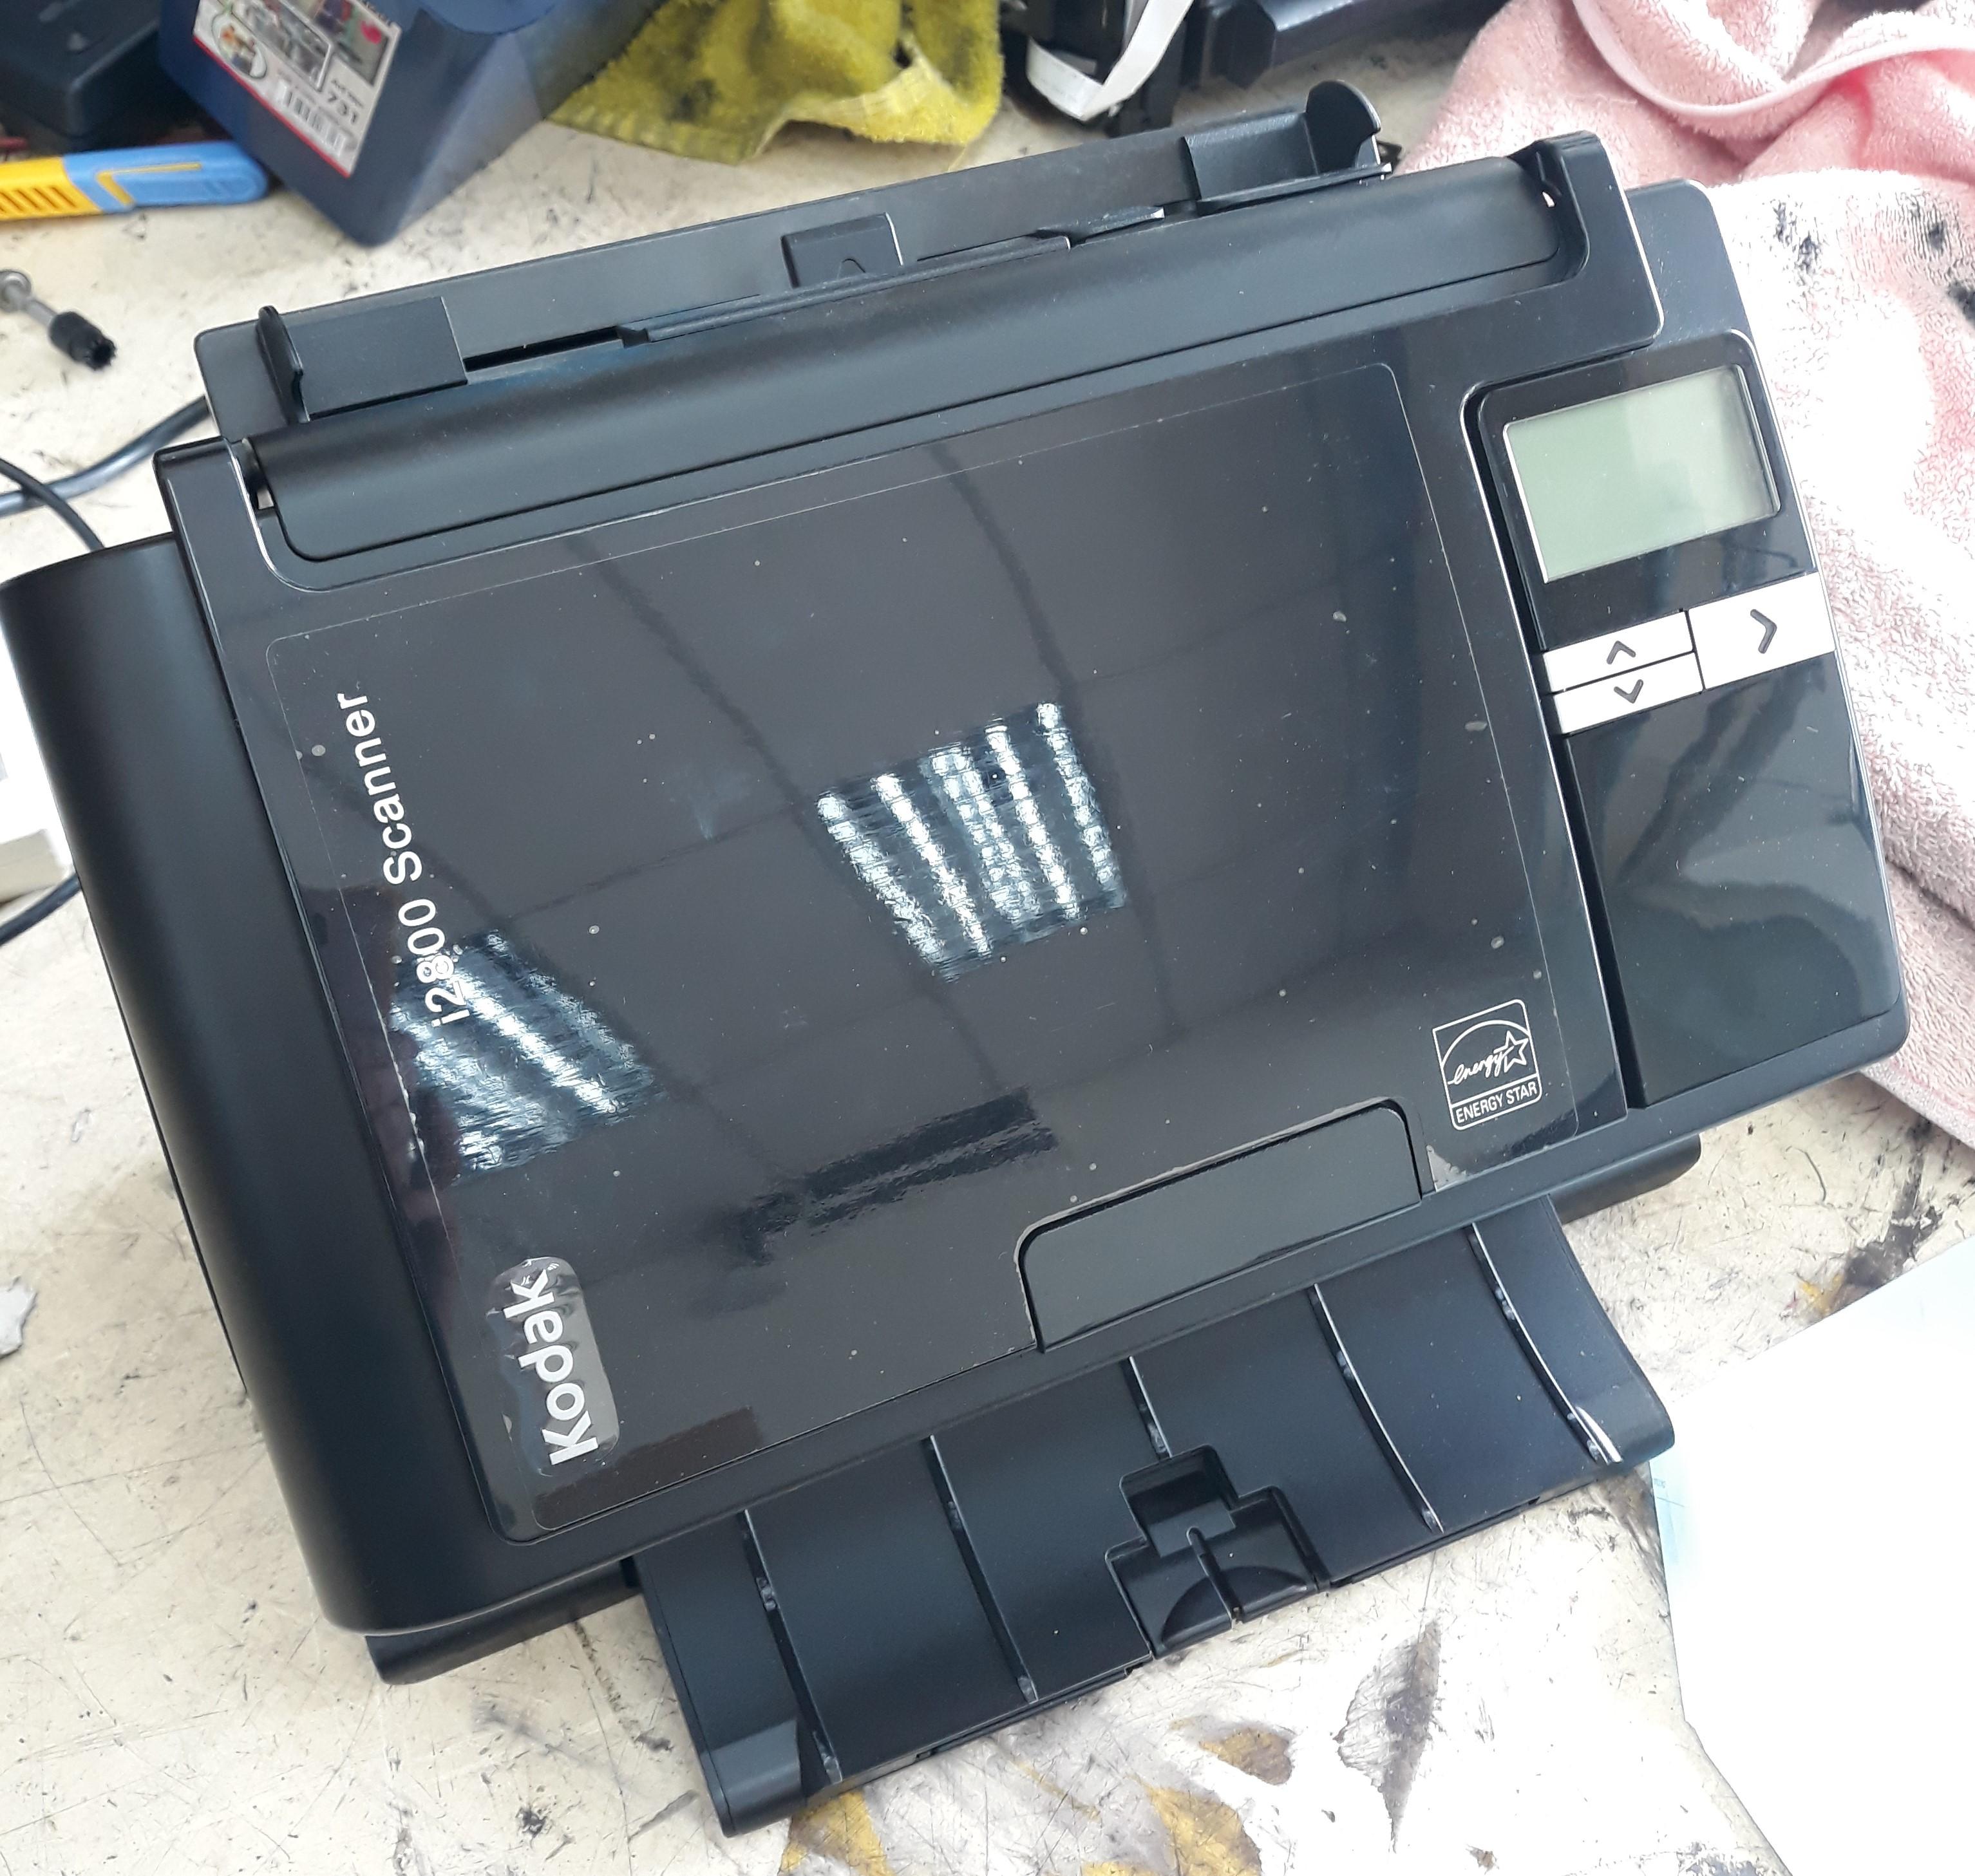 Kodak i2800 A4 ADF Scanner - Scanner Parts & Service